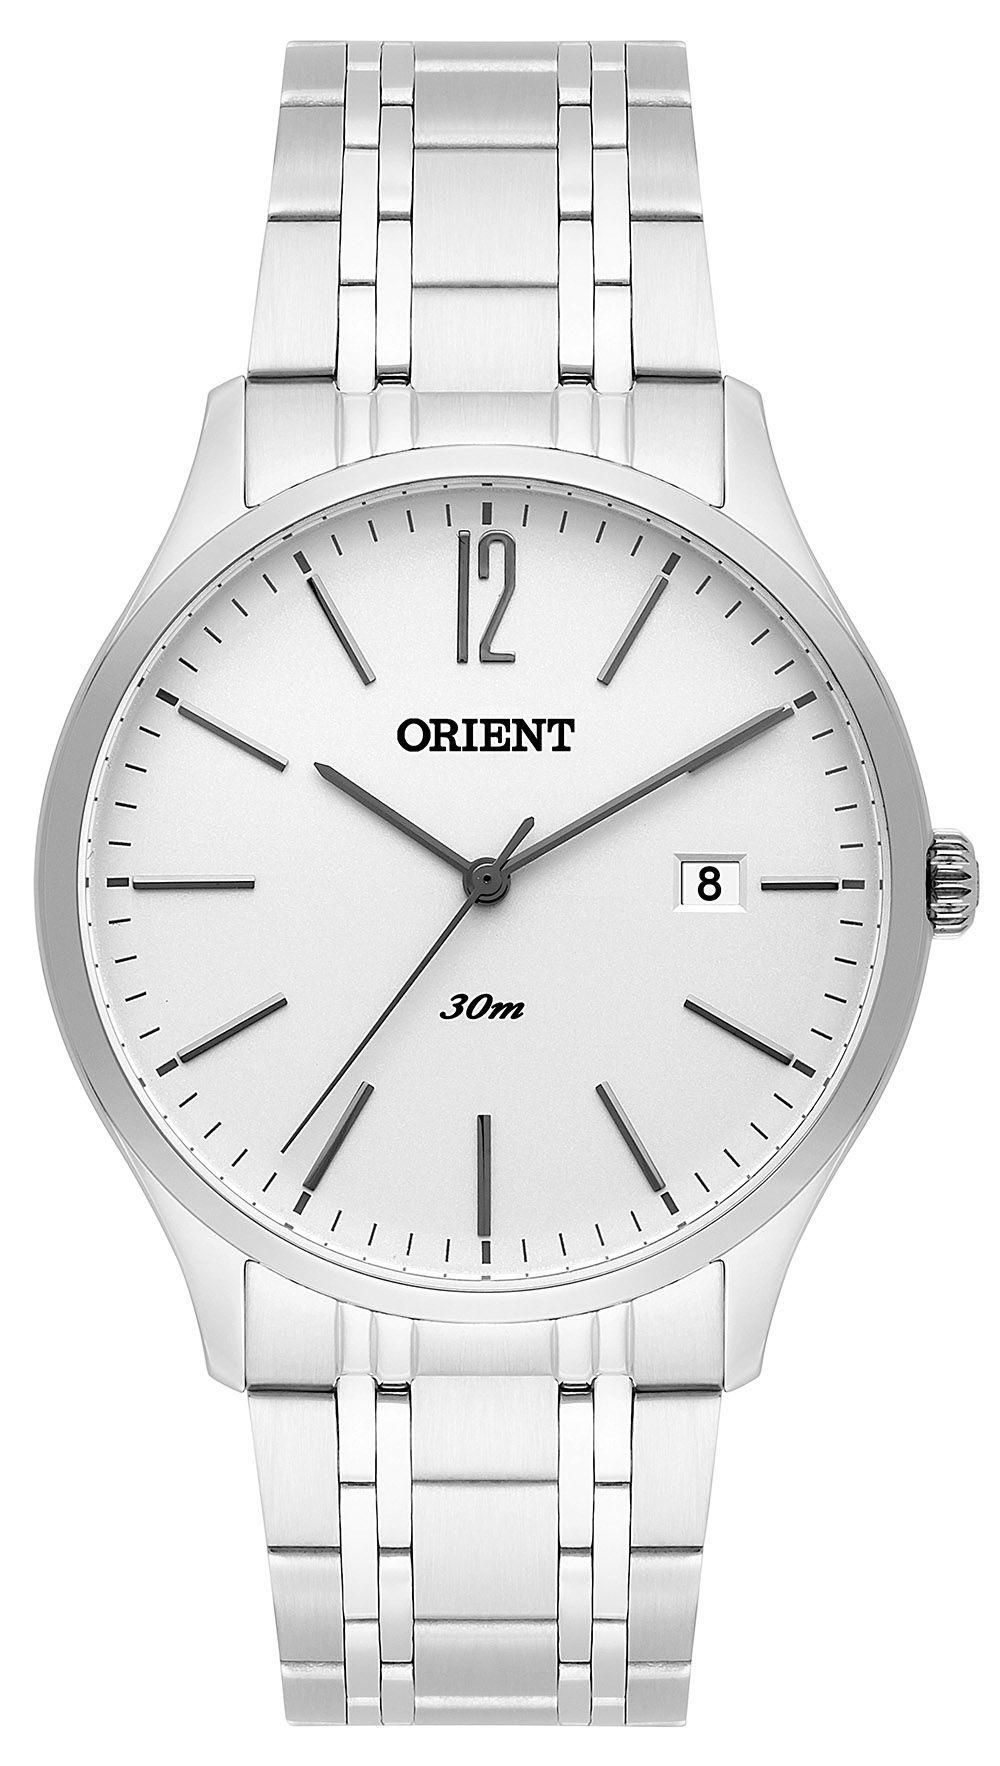 Relógio Masculino Orient MBSS1310-S2SX Prata